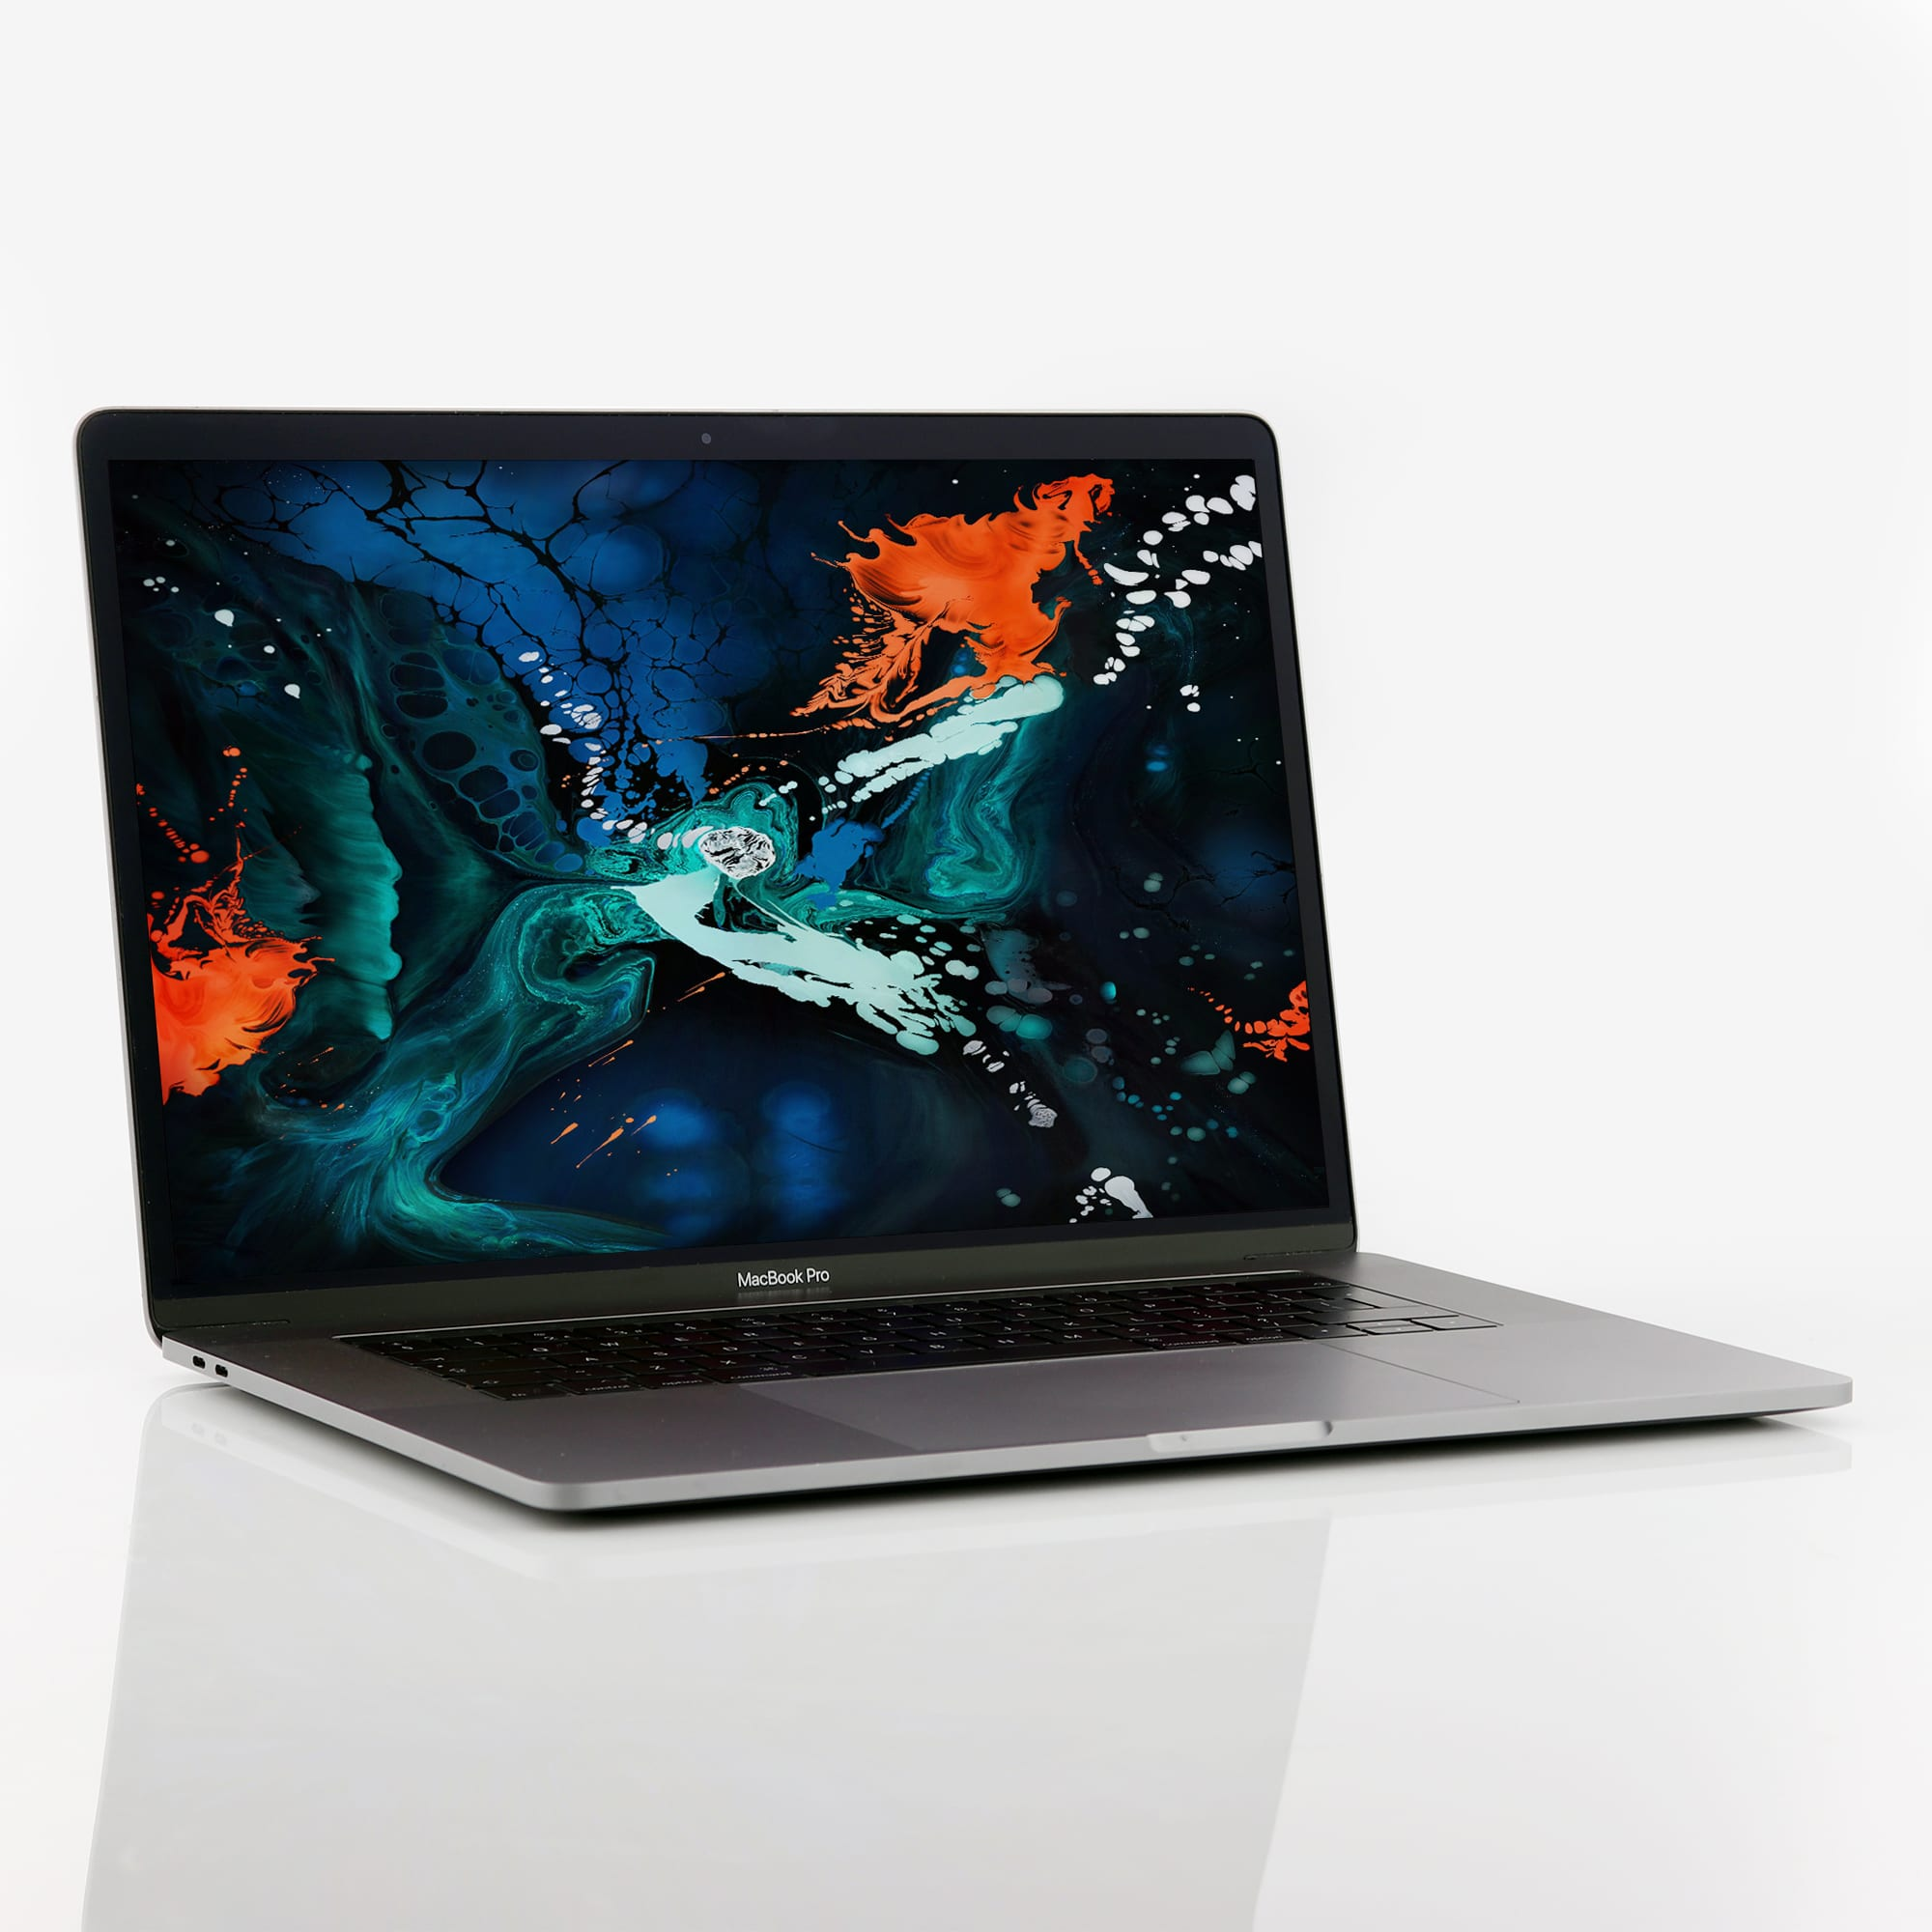 1 x Apple MacBook Pro Retina 15 Inch Touchbar Intel Core i7 2.90 GHz (2017)